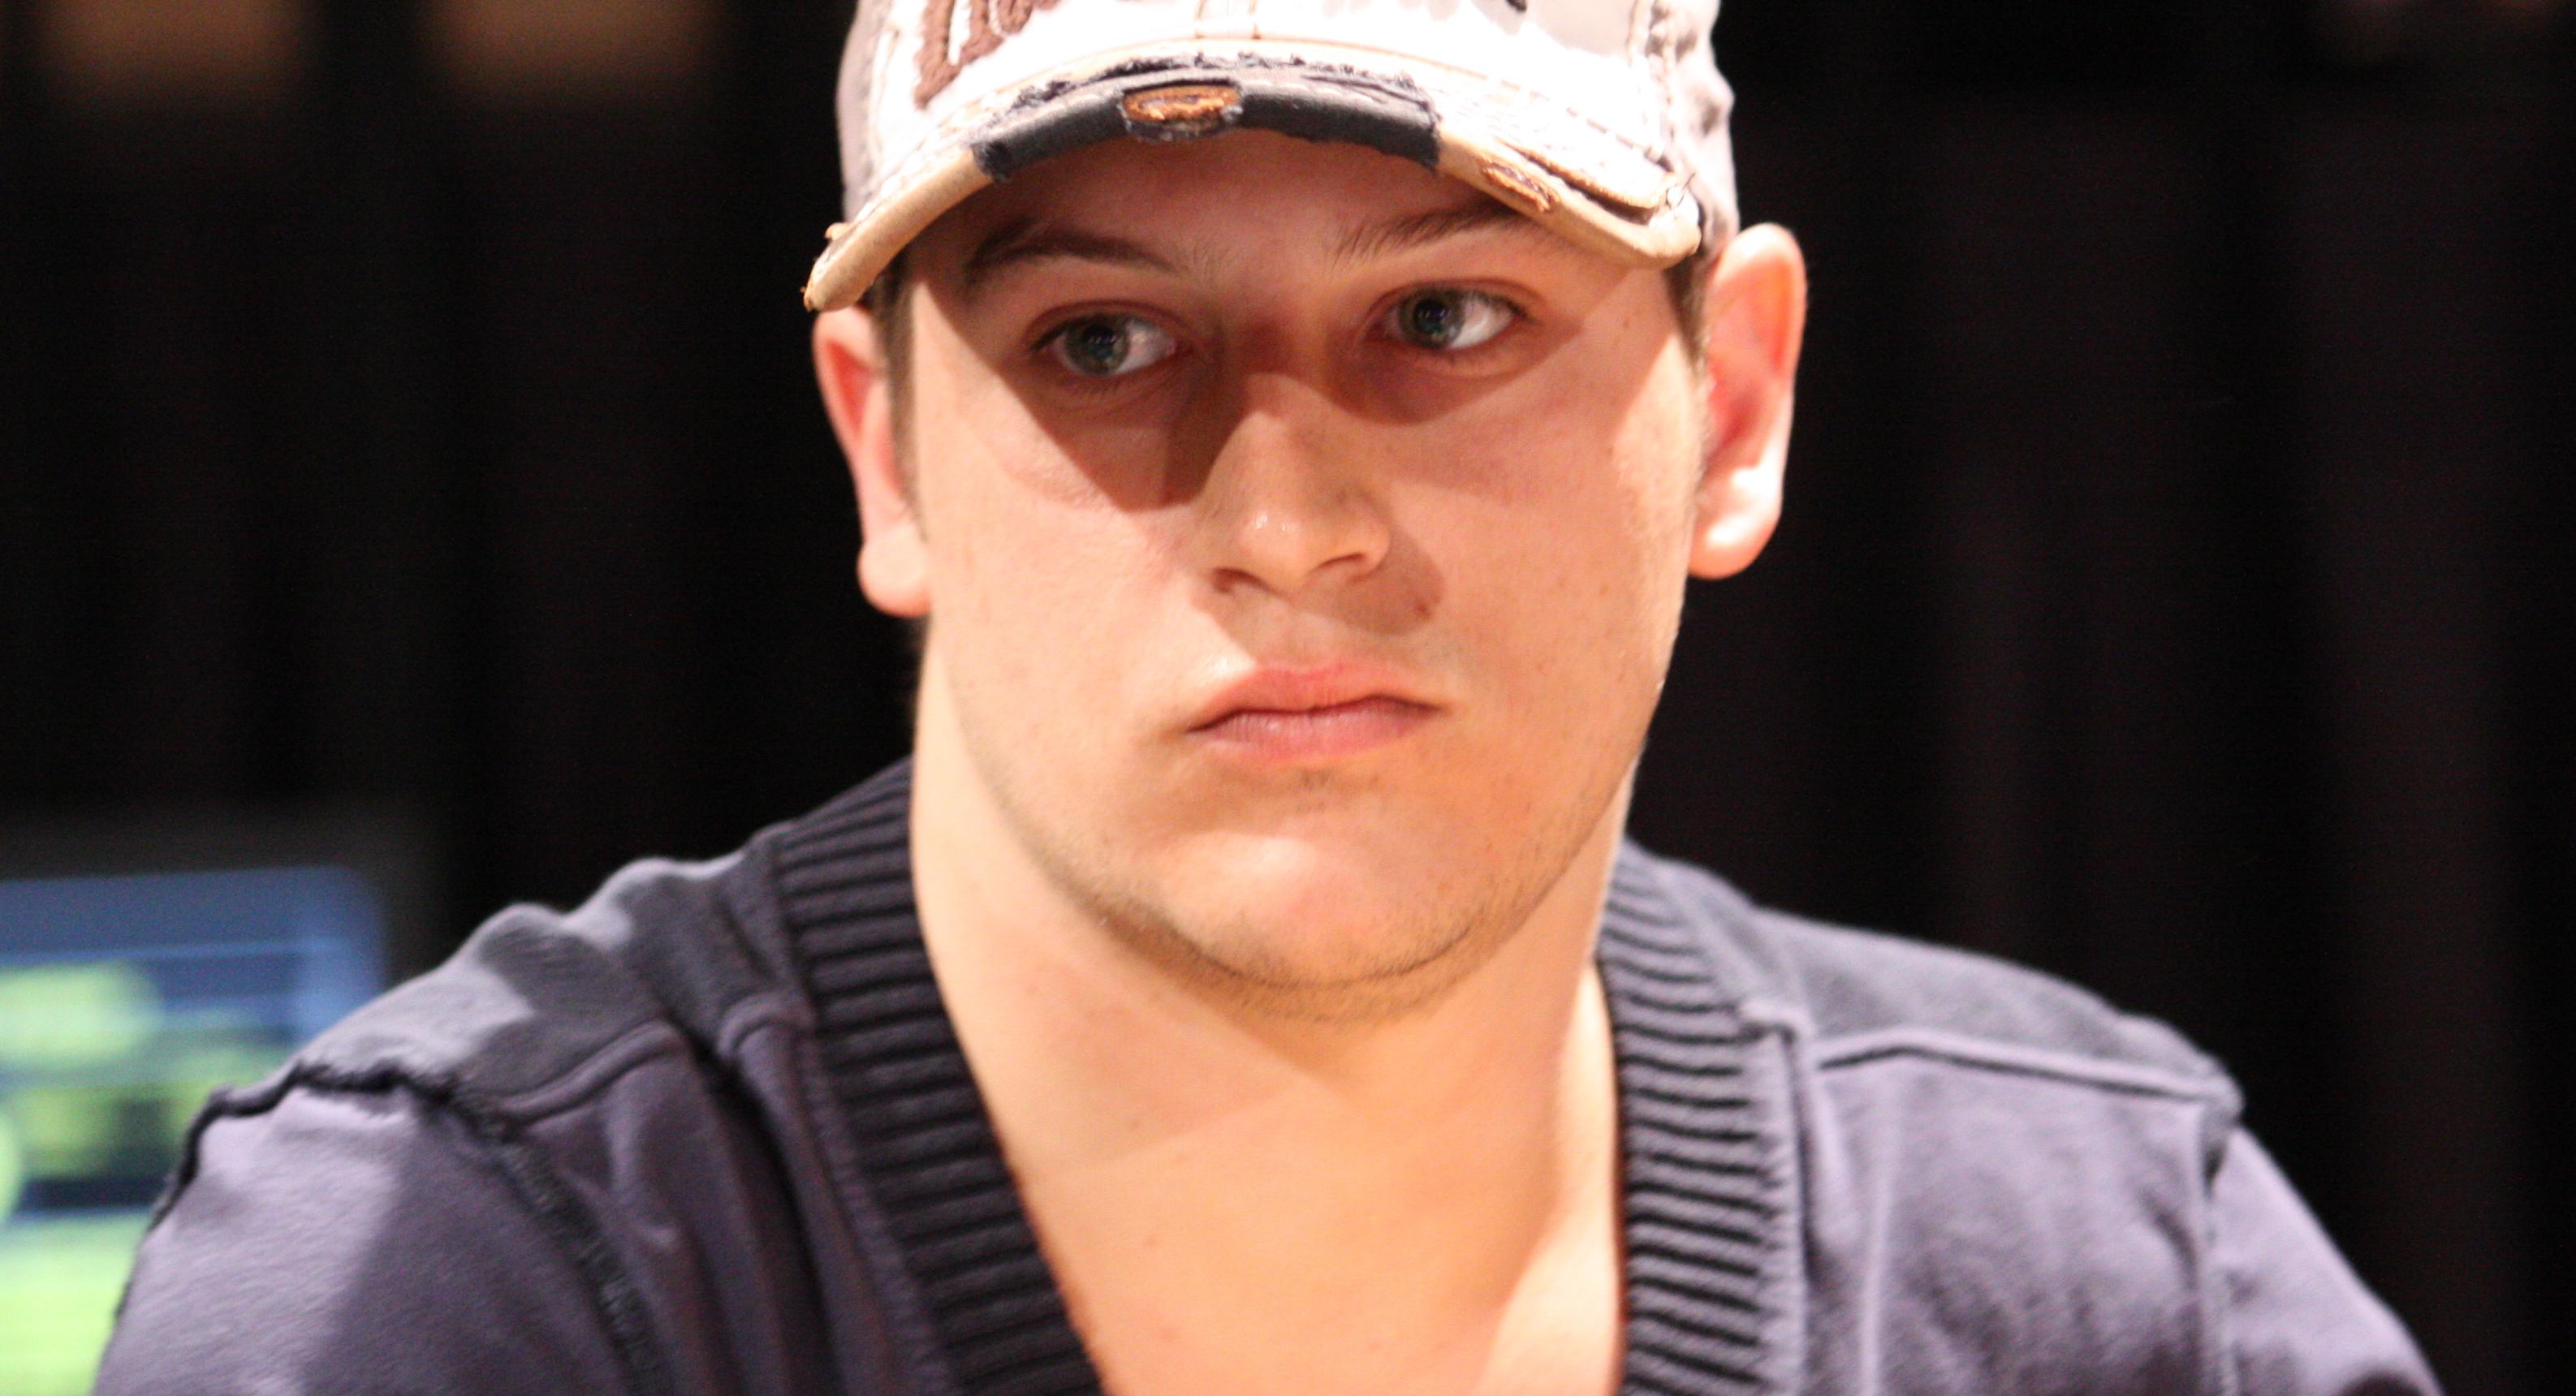 Matthew Marafioti